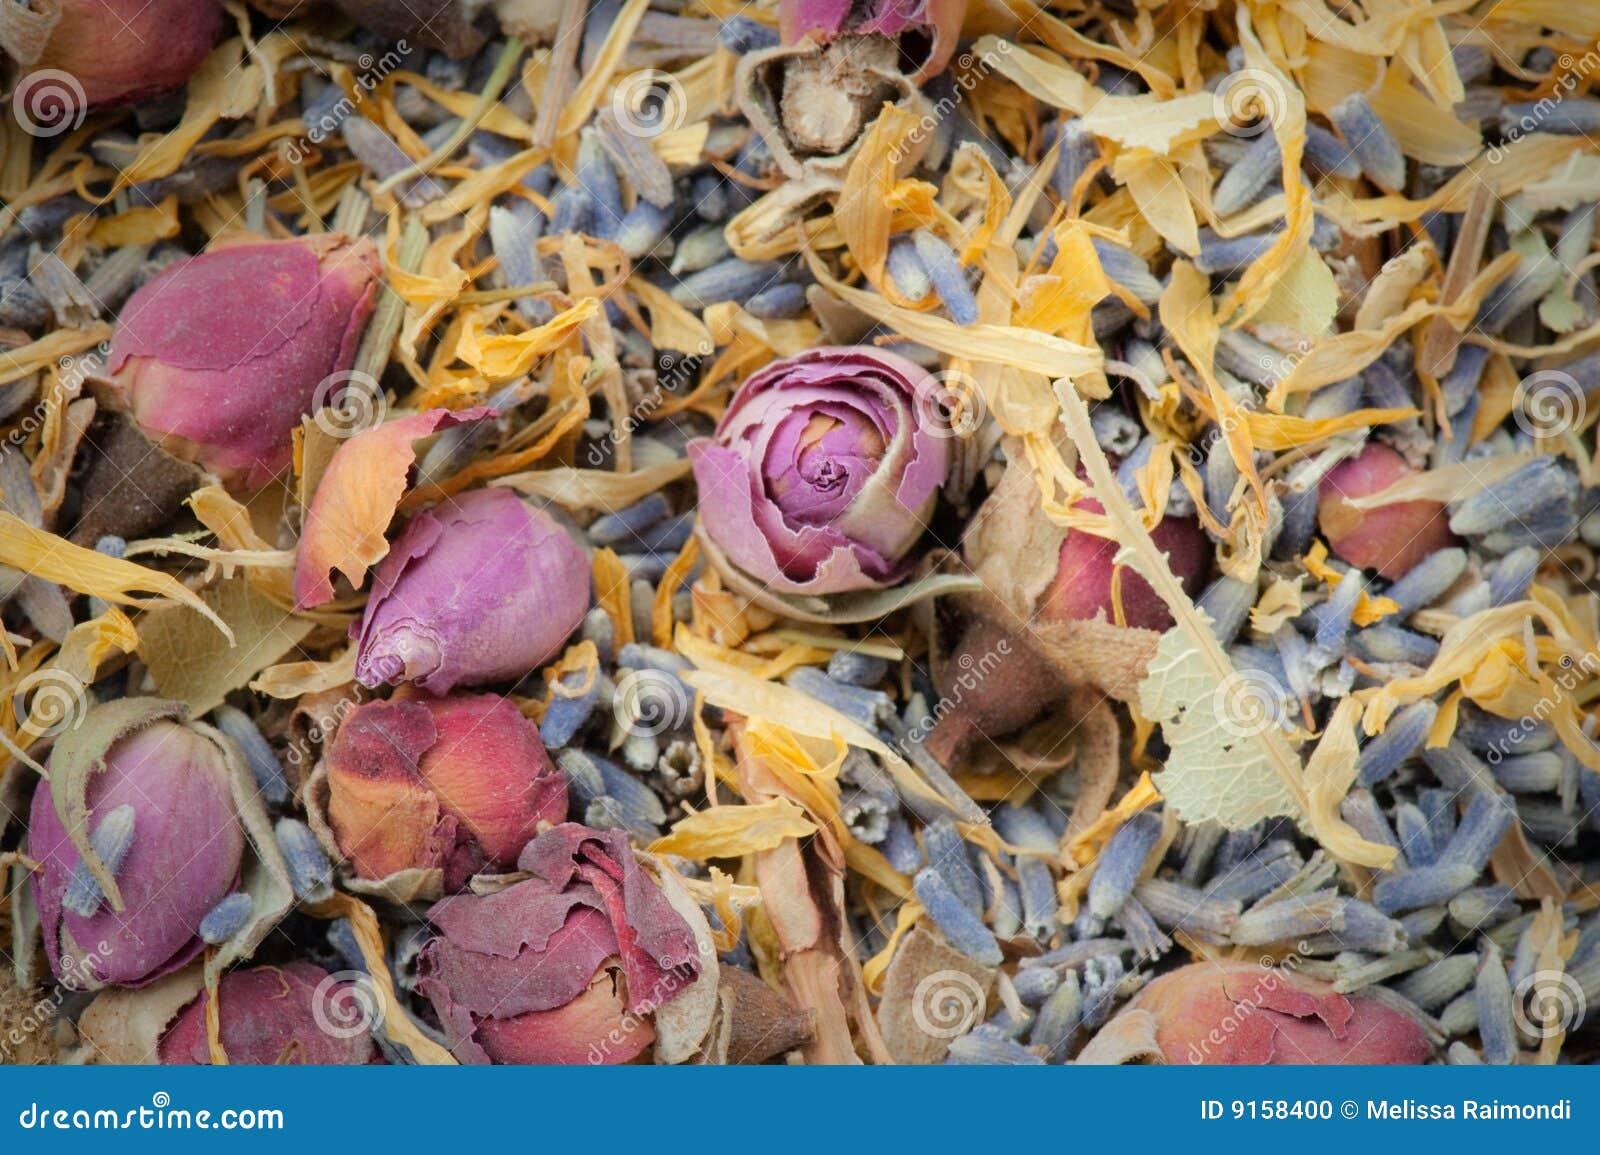 Dried flower potpourri aromatherapy